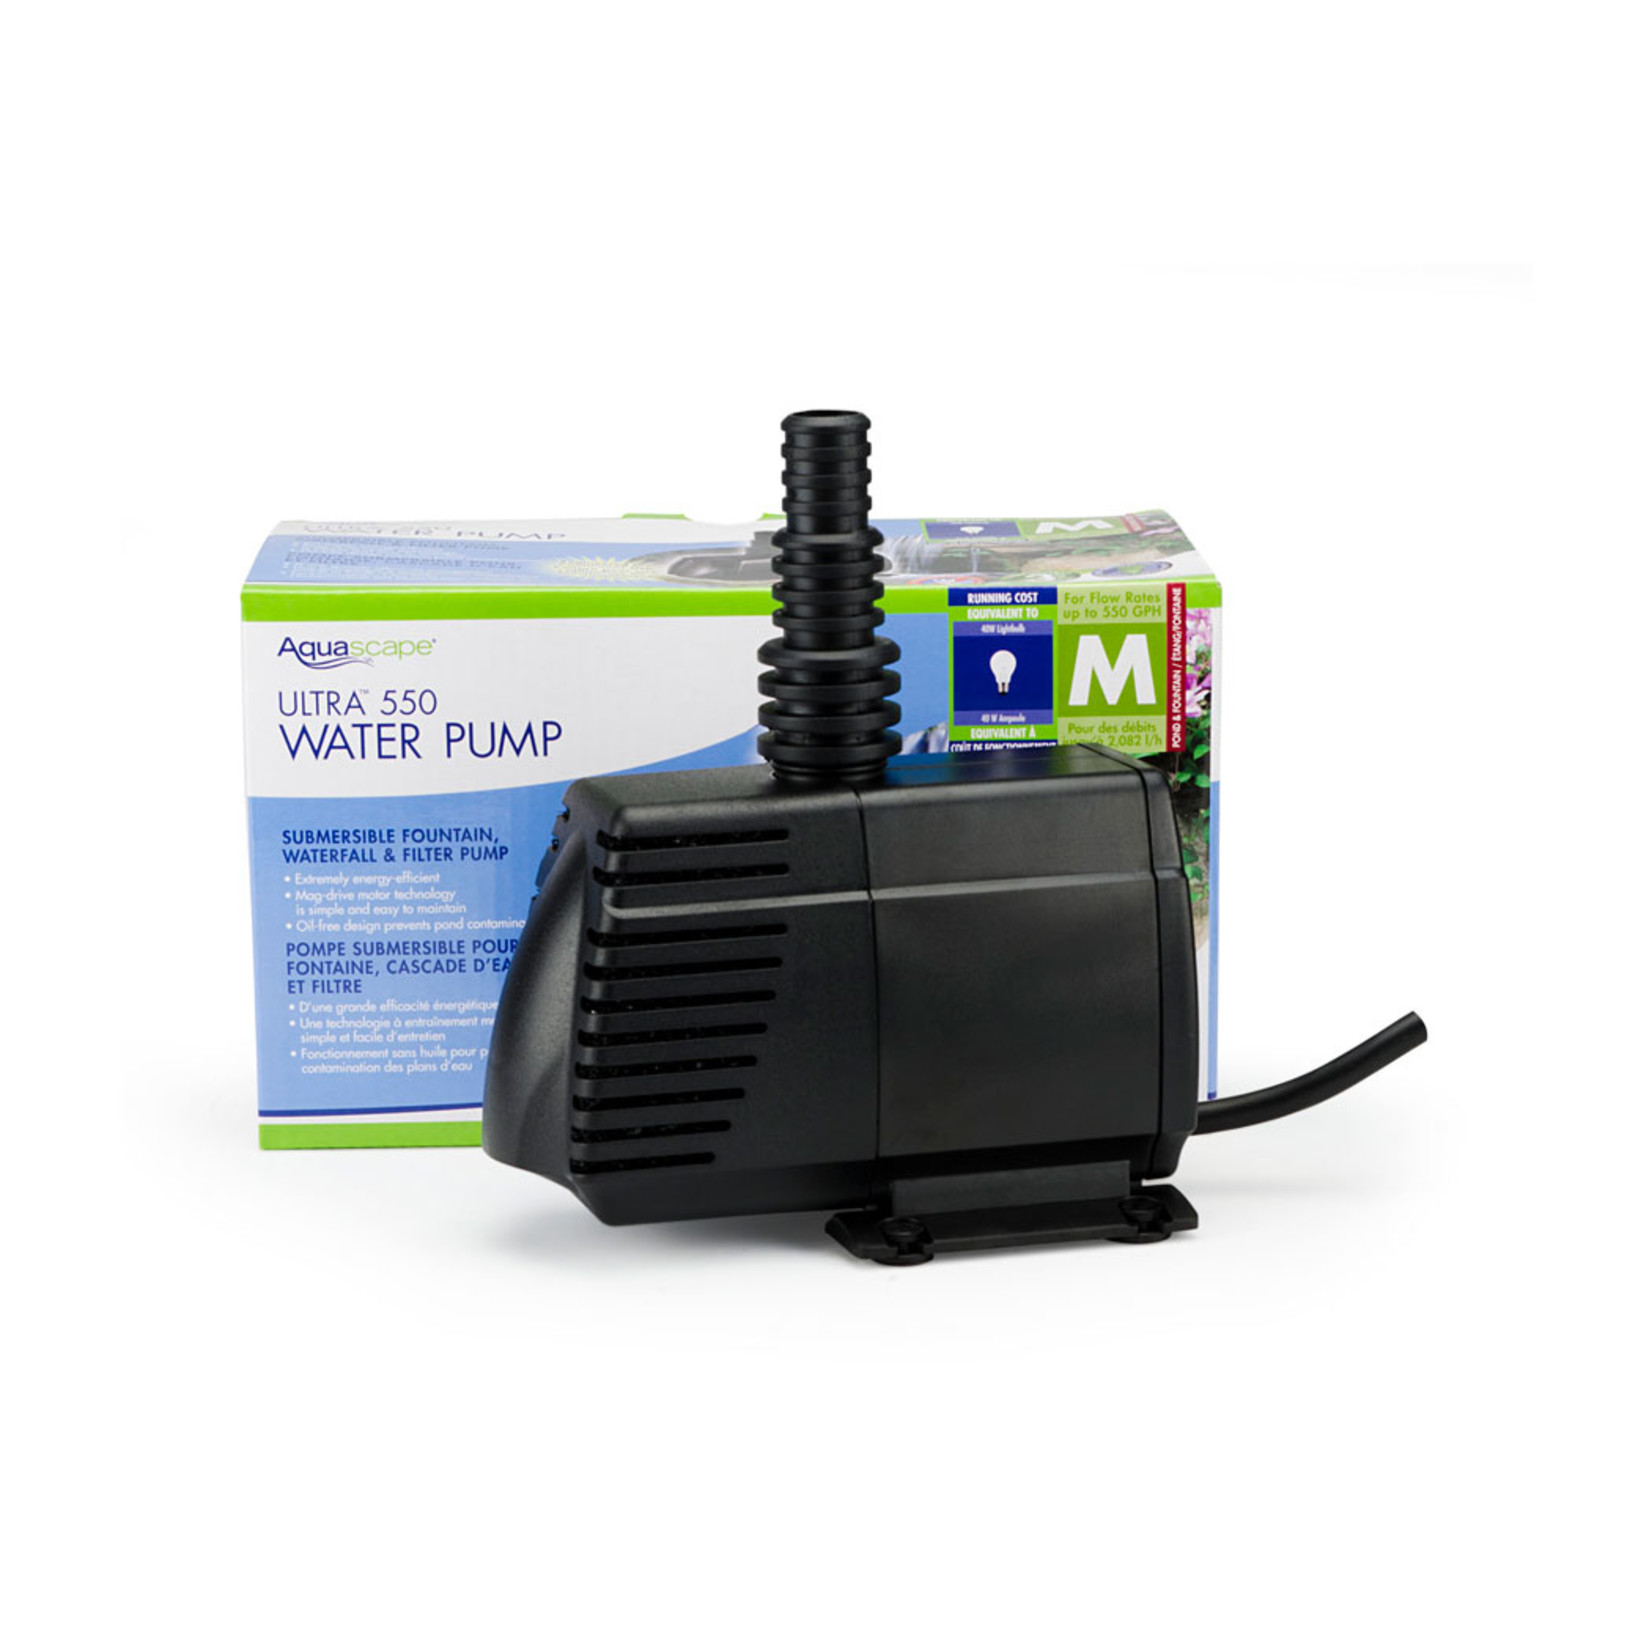 Aquascape Pompe D'eau Ultra 550